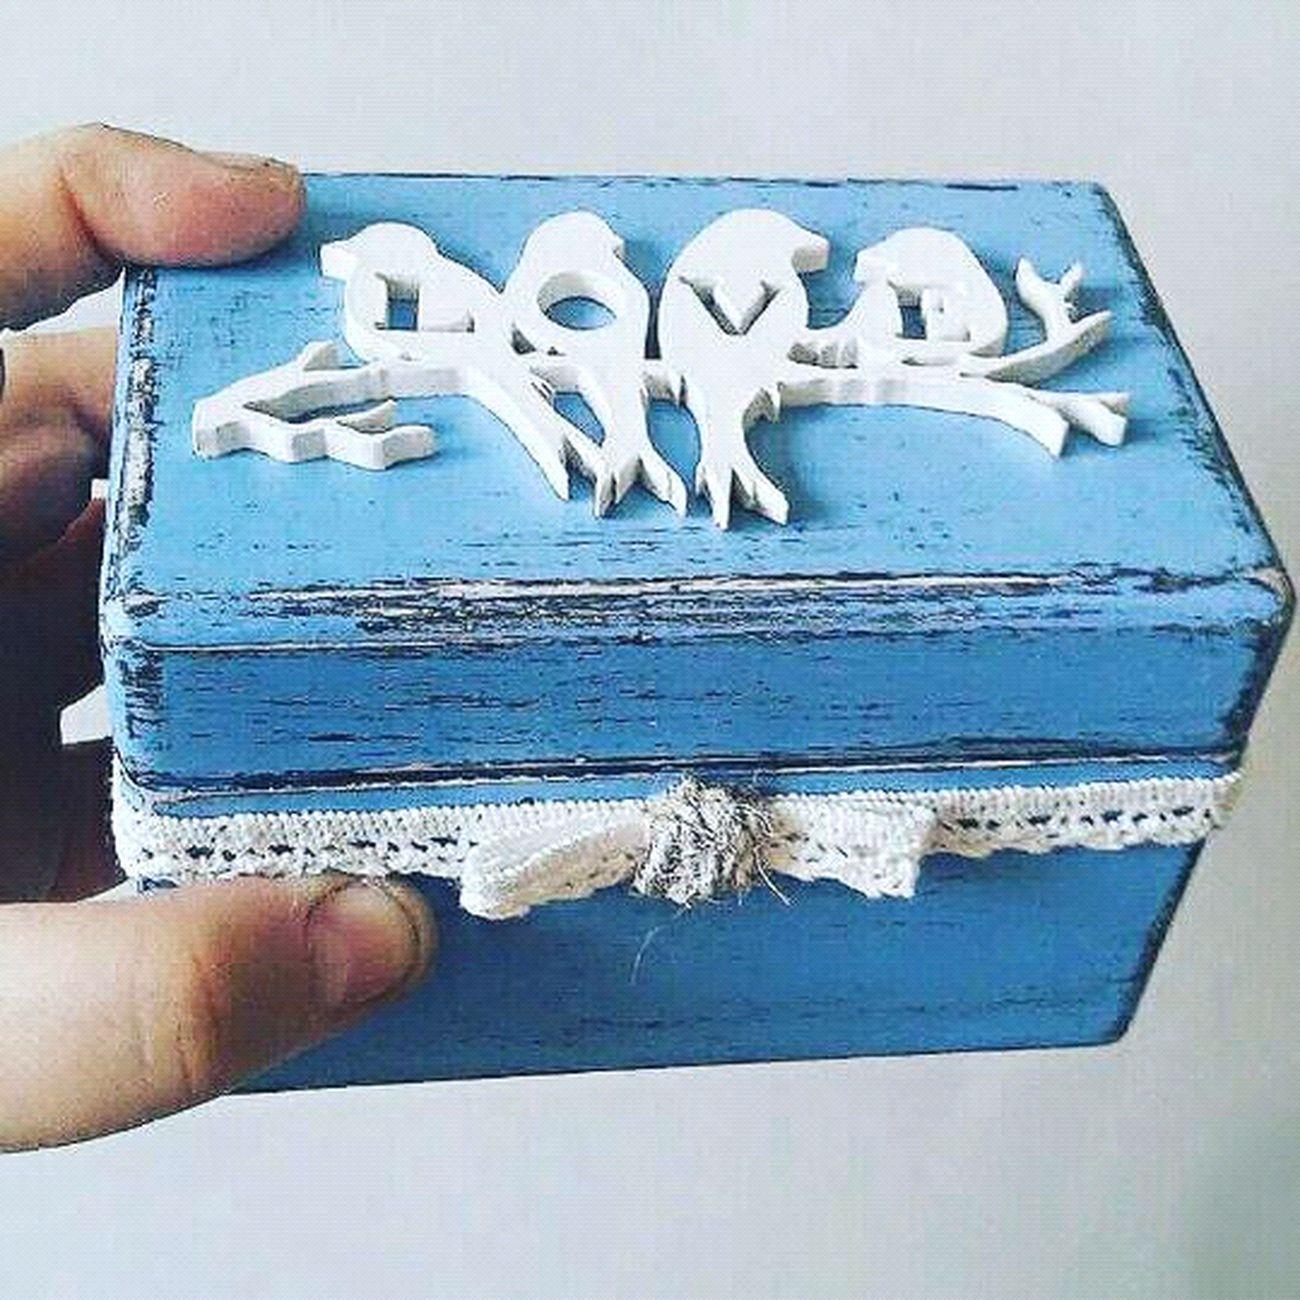 Wedding Ring Rustic Style Ringbox Wedding Handmade Ukraine Crafts ✂️ Art, Drawing, Creativity Box Braids Arts And Crafts Handmadewithlove Hand Made